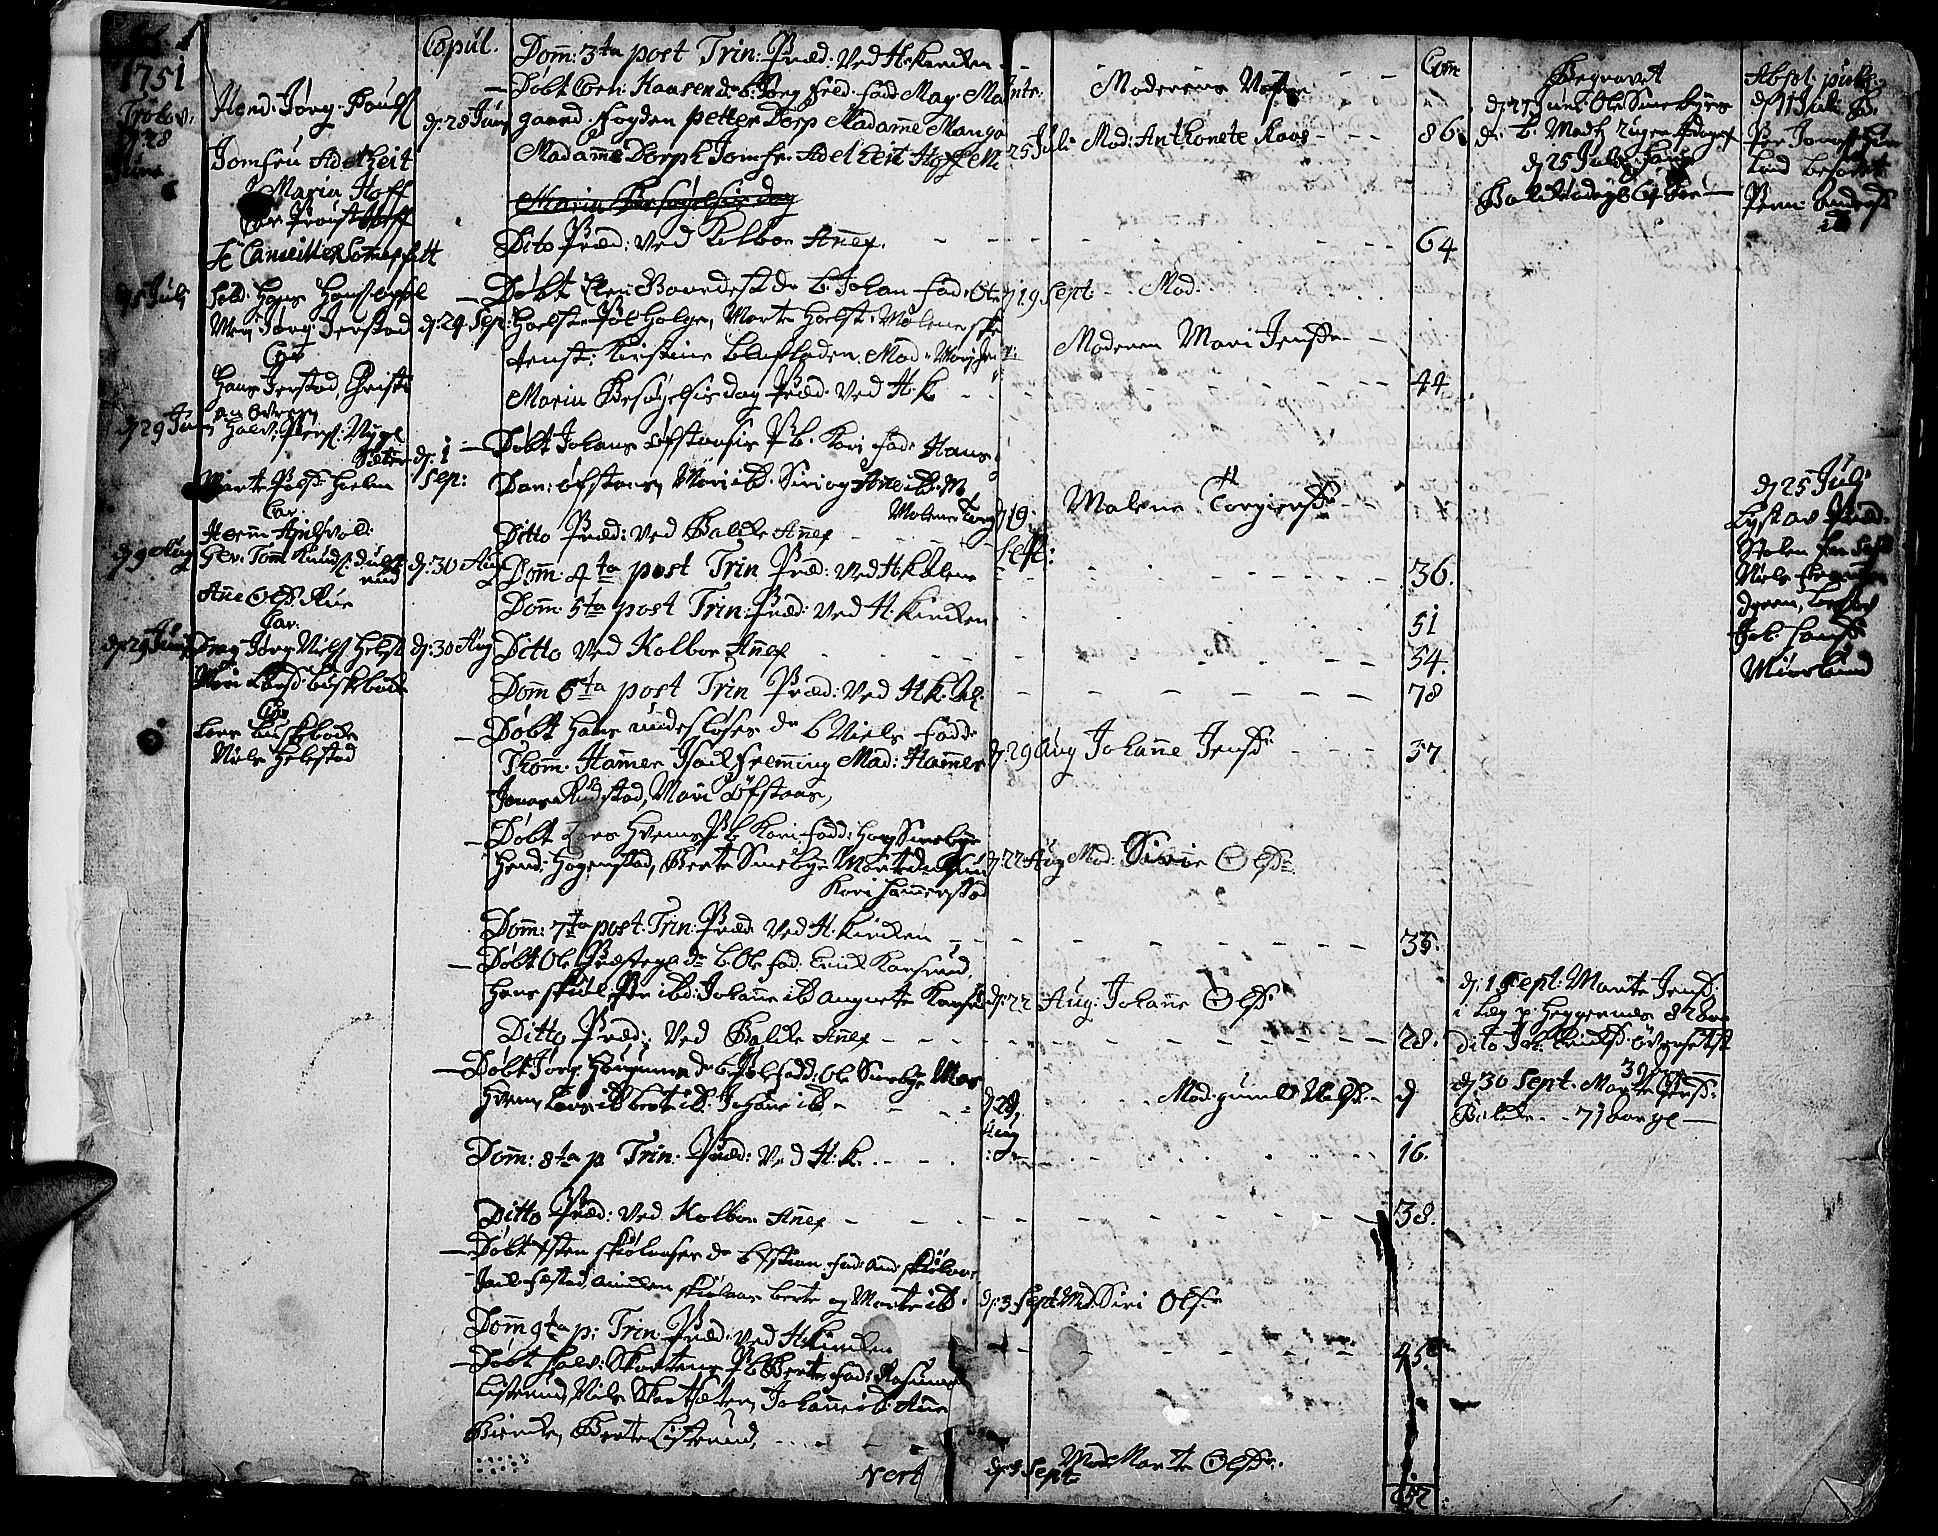 SAH, Toten prestekontor, Ministerialbok nr. 4, 1751-1761, s. 1